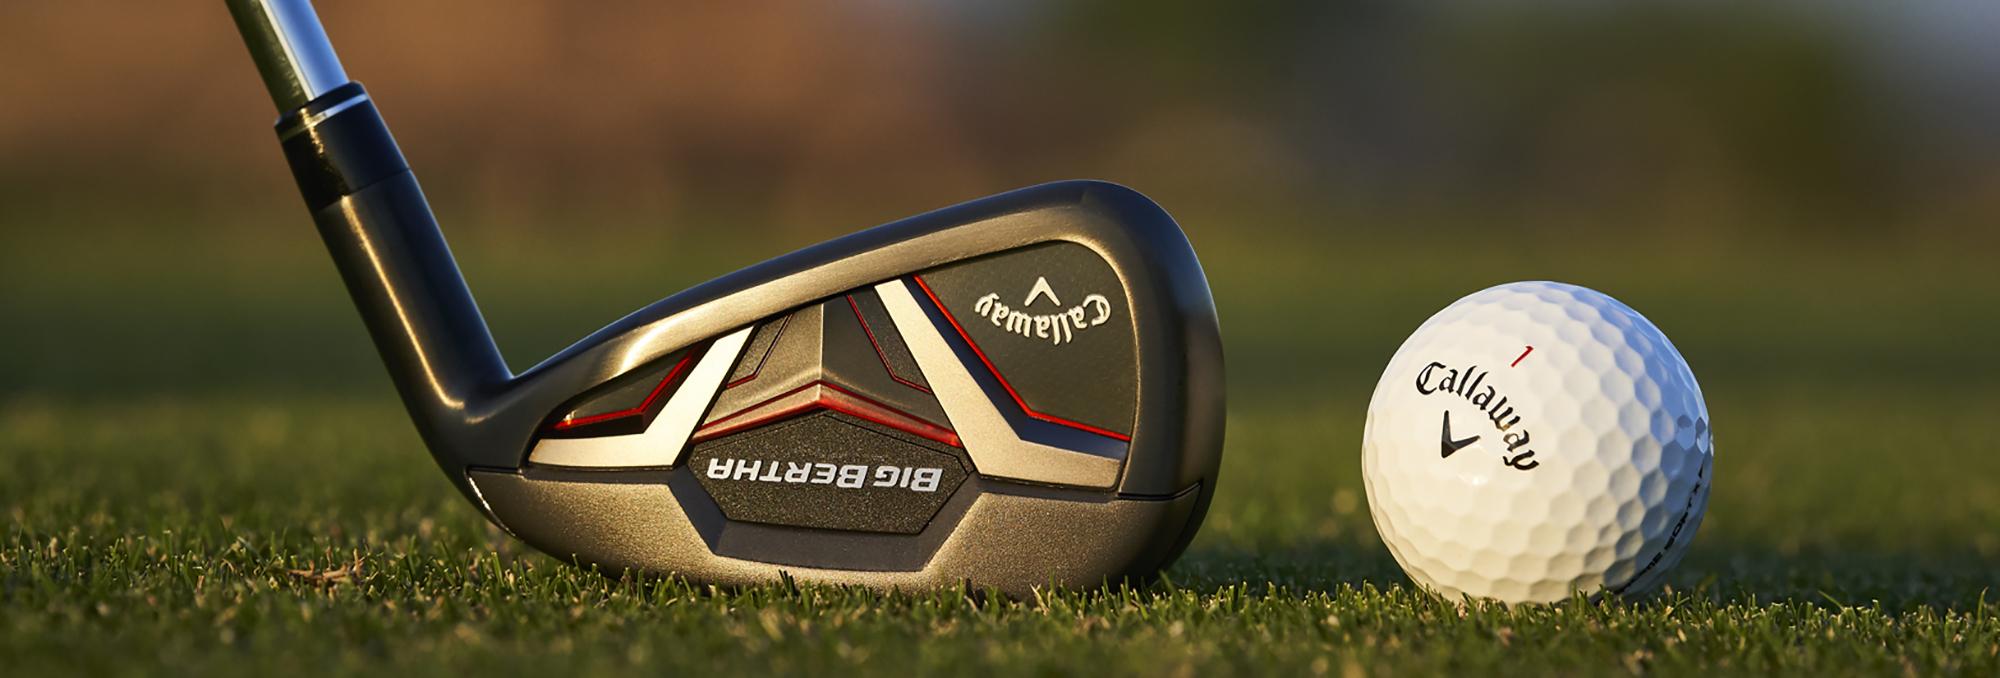 Callaway Big Bertha Irons on course with Callaway chrome soft golf ball